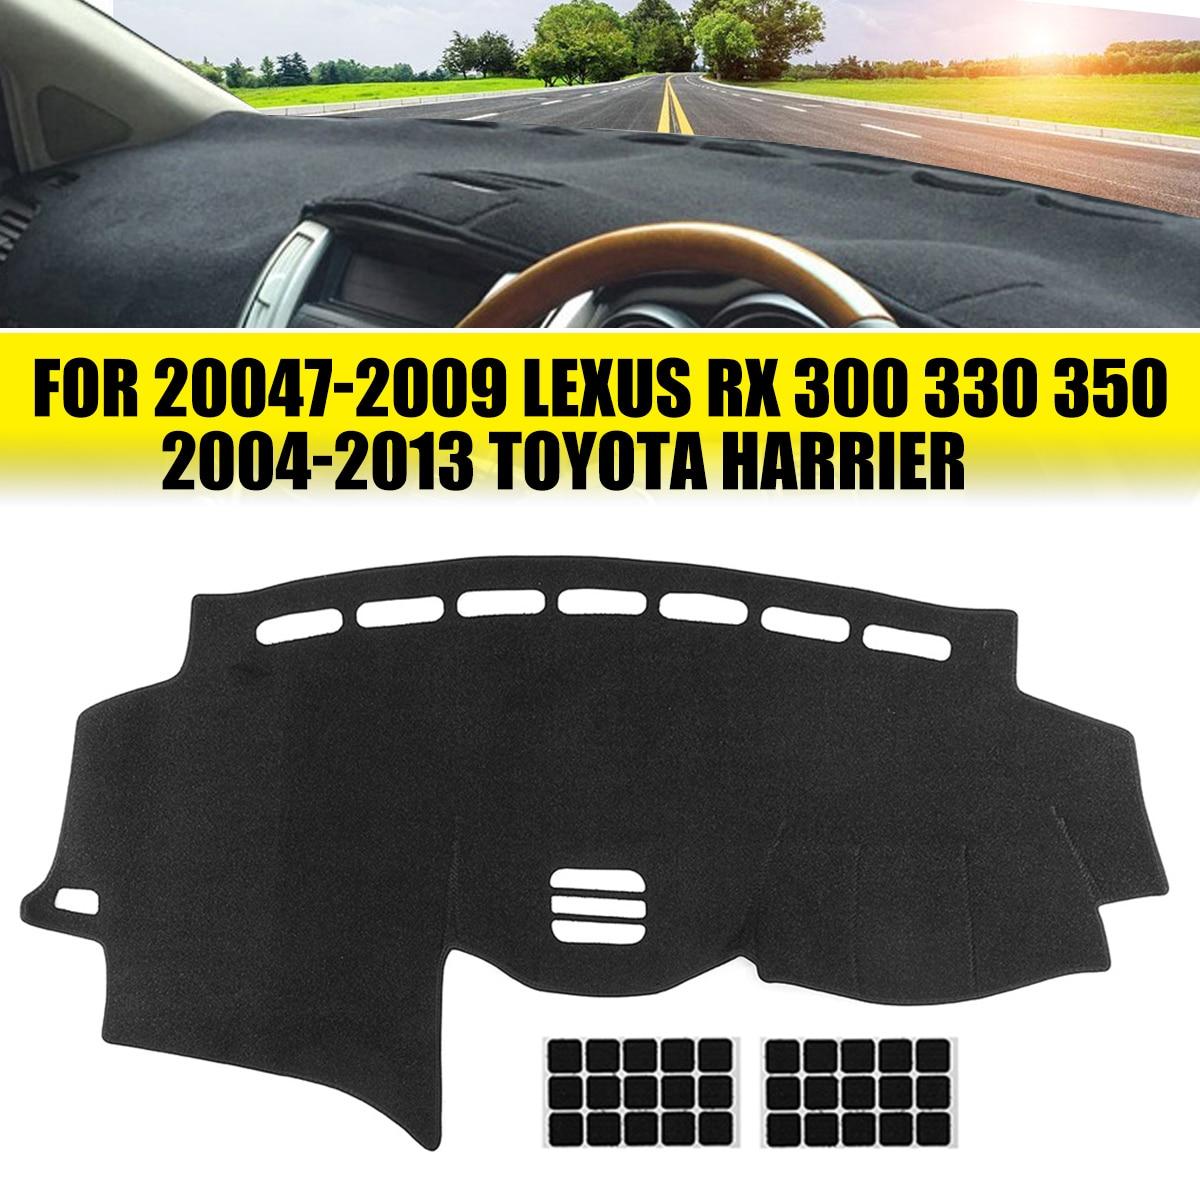 2013 Lexus Rx 350 For Sale: 1Pc Car Dashmat Dashboard Mat Dash Board Cover Anti Slip